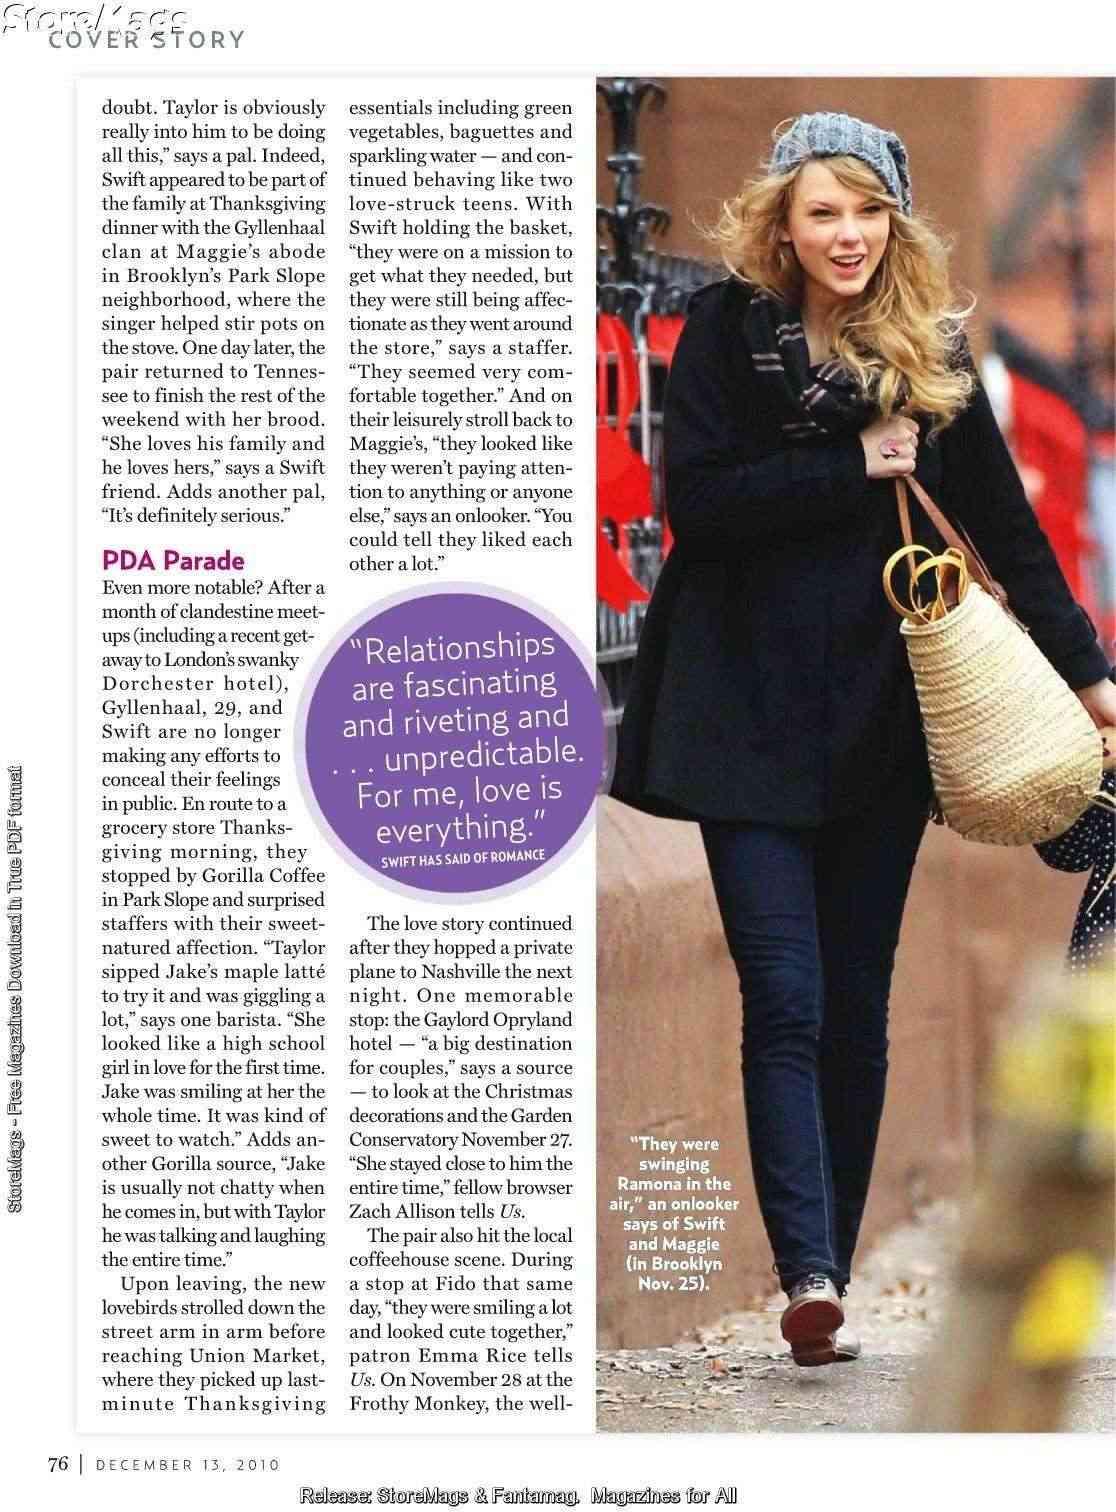 Taylor Swift - US Weekly - December 2010 Forum_82